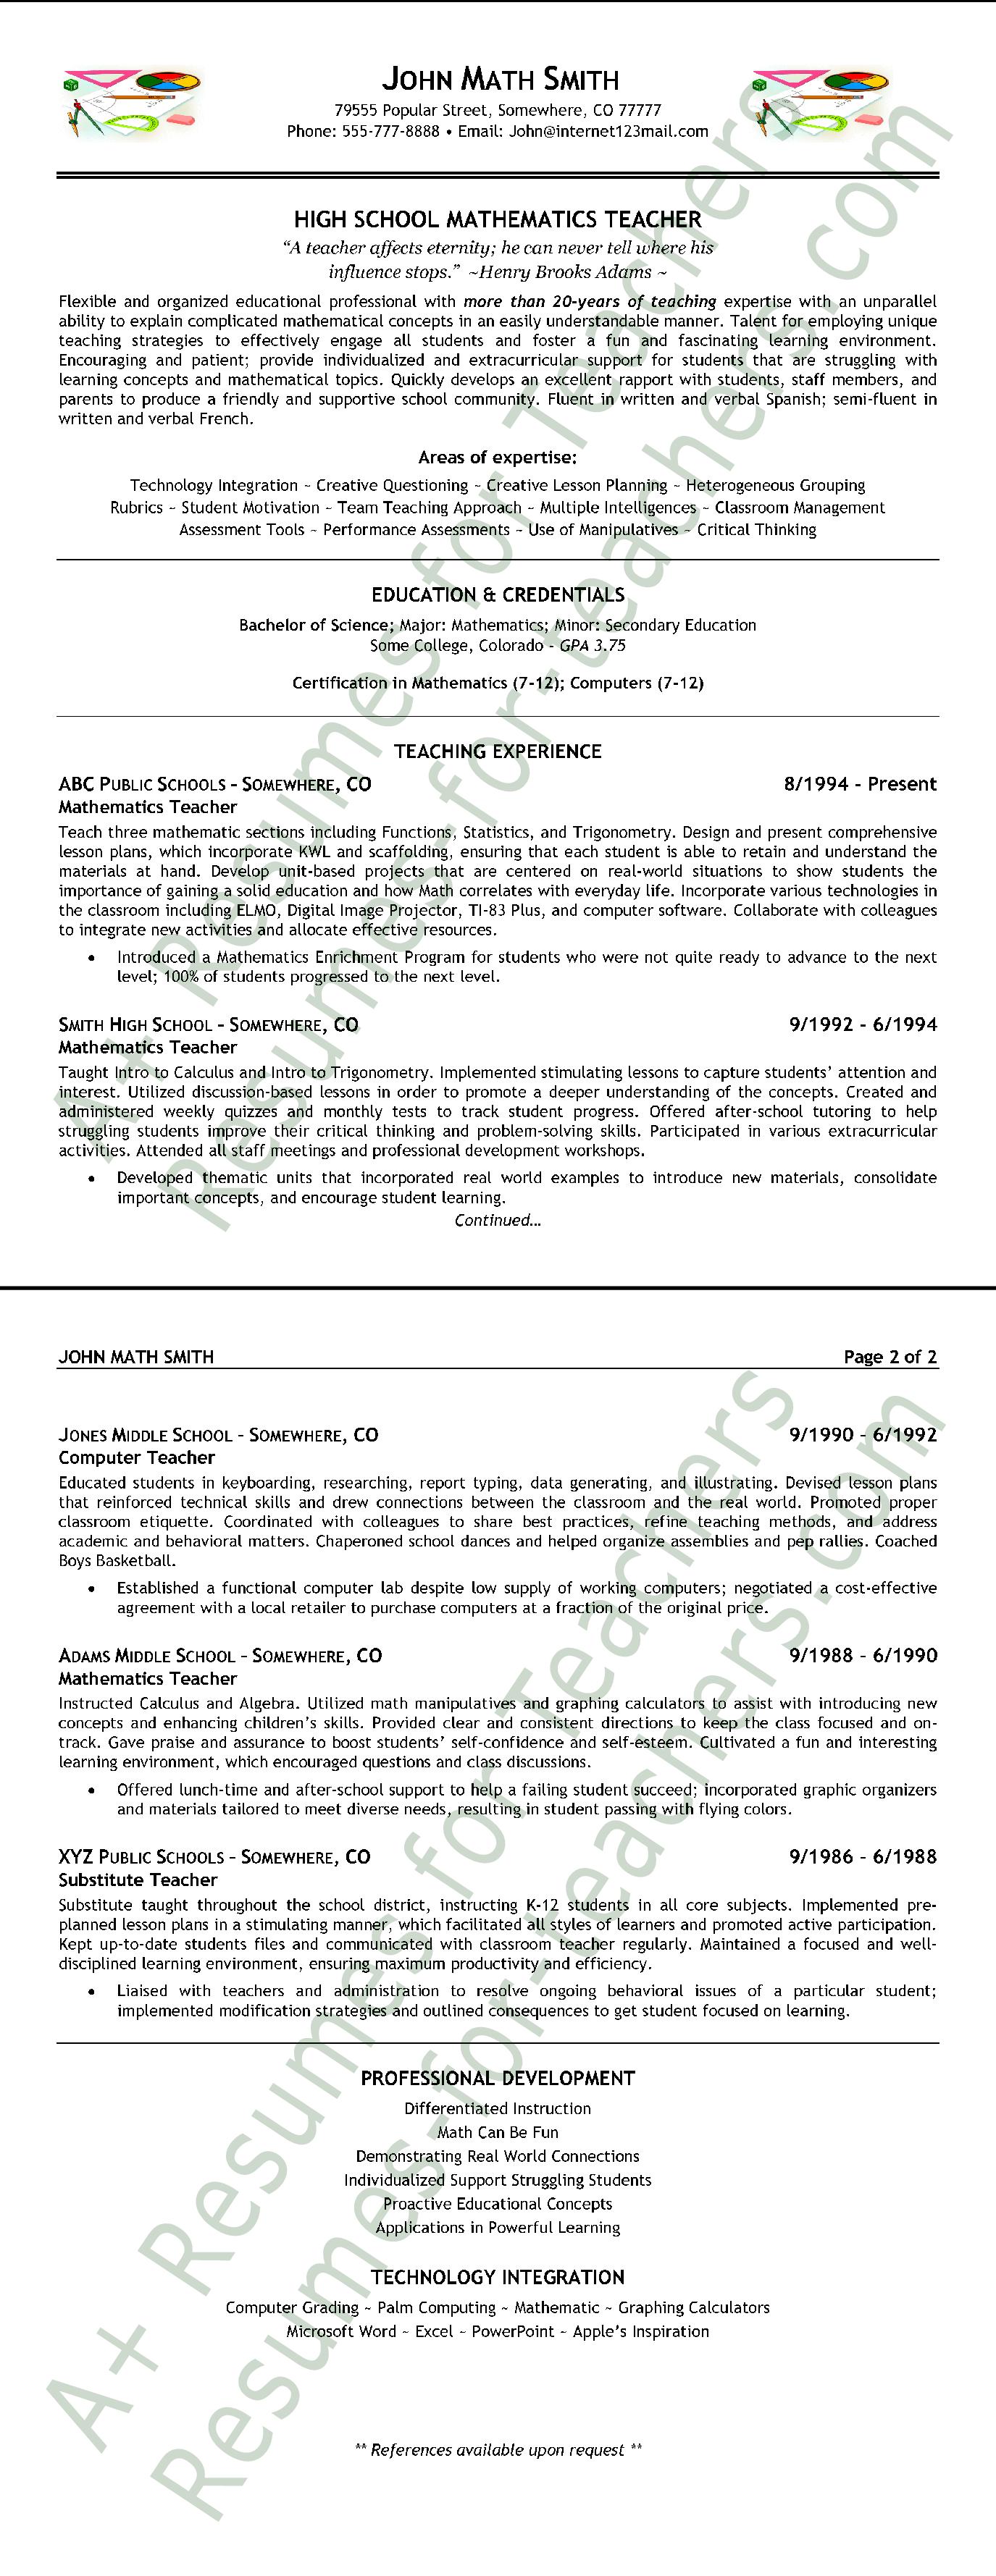 Free High School Mathematics Teacher Resume Format | Templates at ...